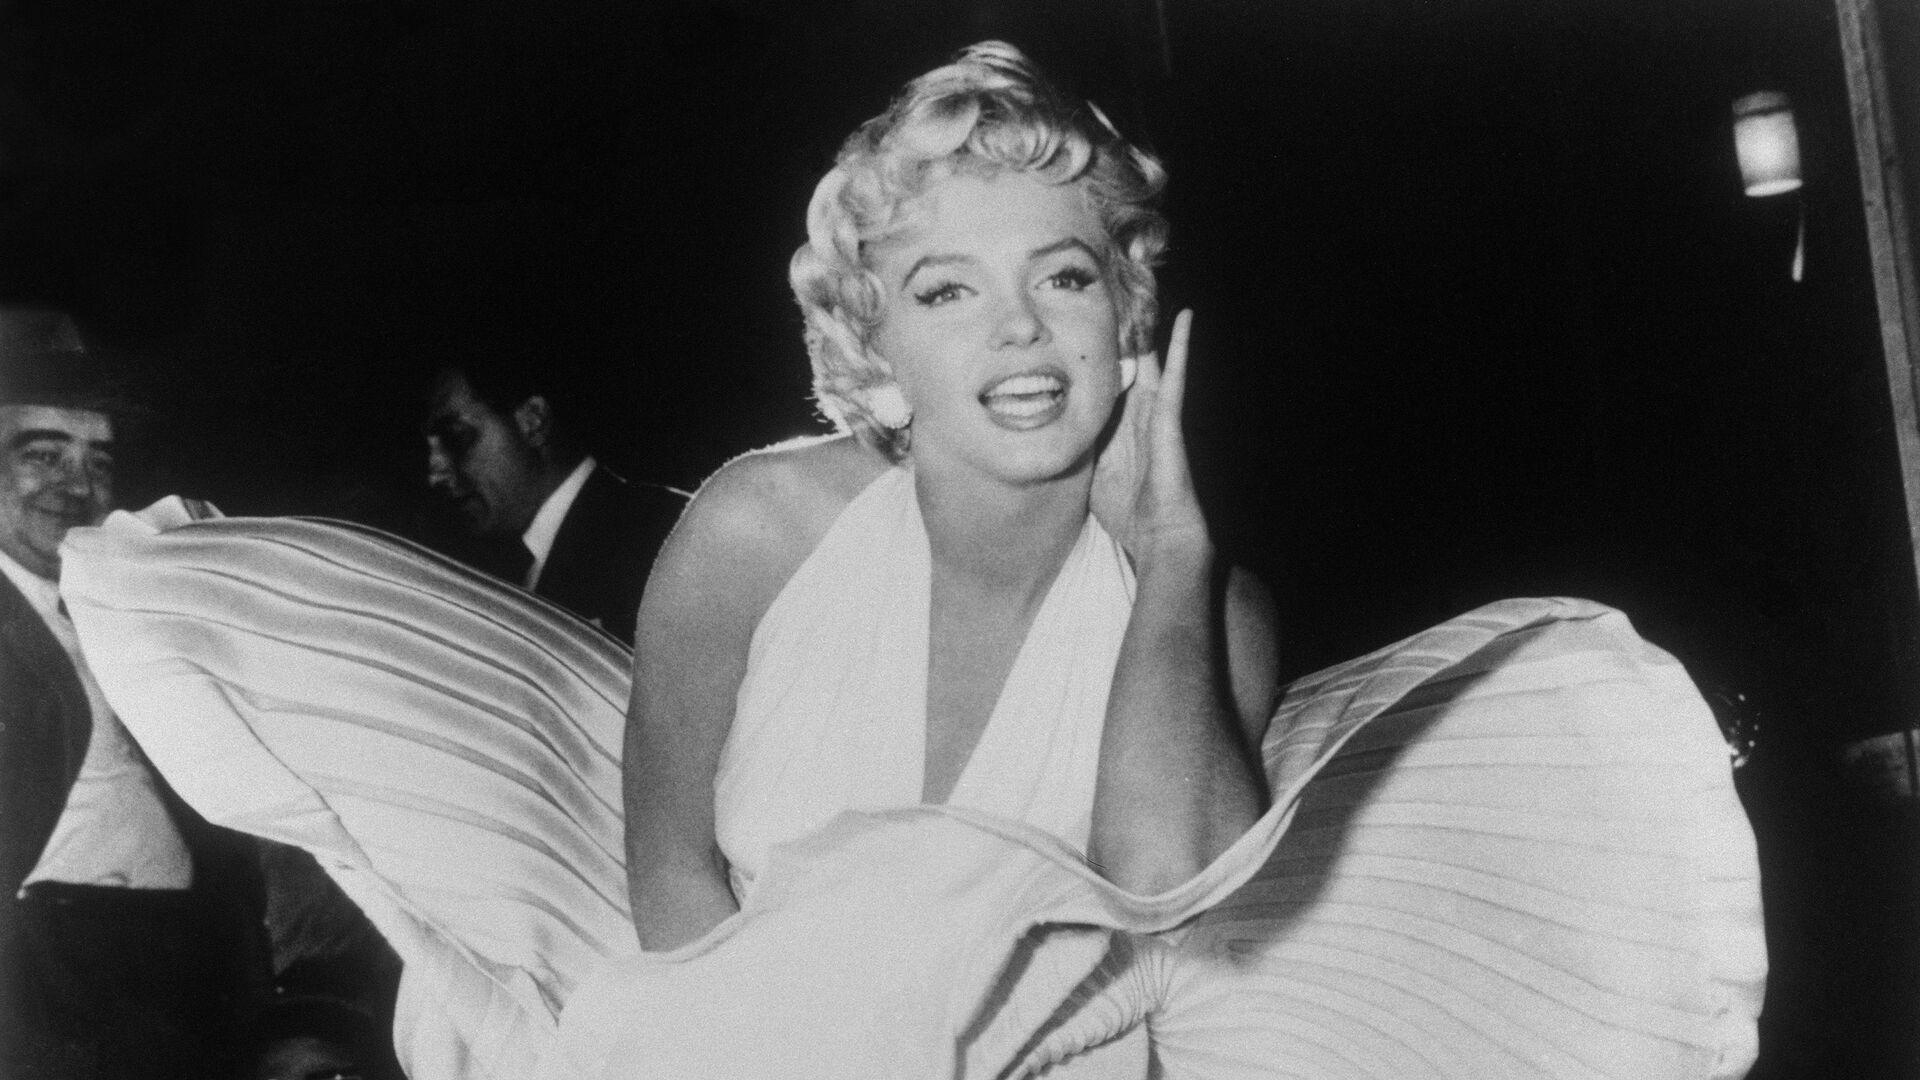 Marilyn Monroe, actriz estadounidense - Sputnik Mundo, 1920, 05.05.2021